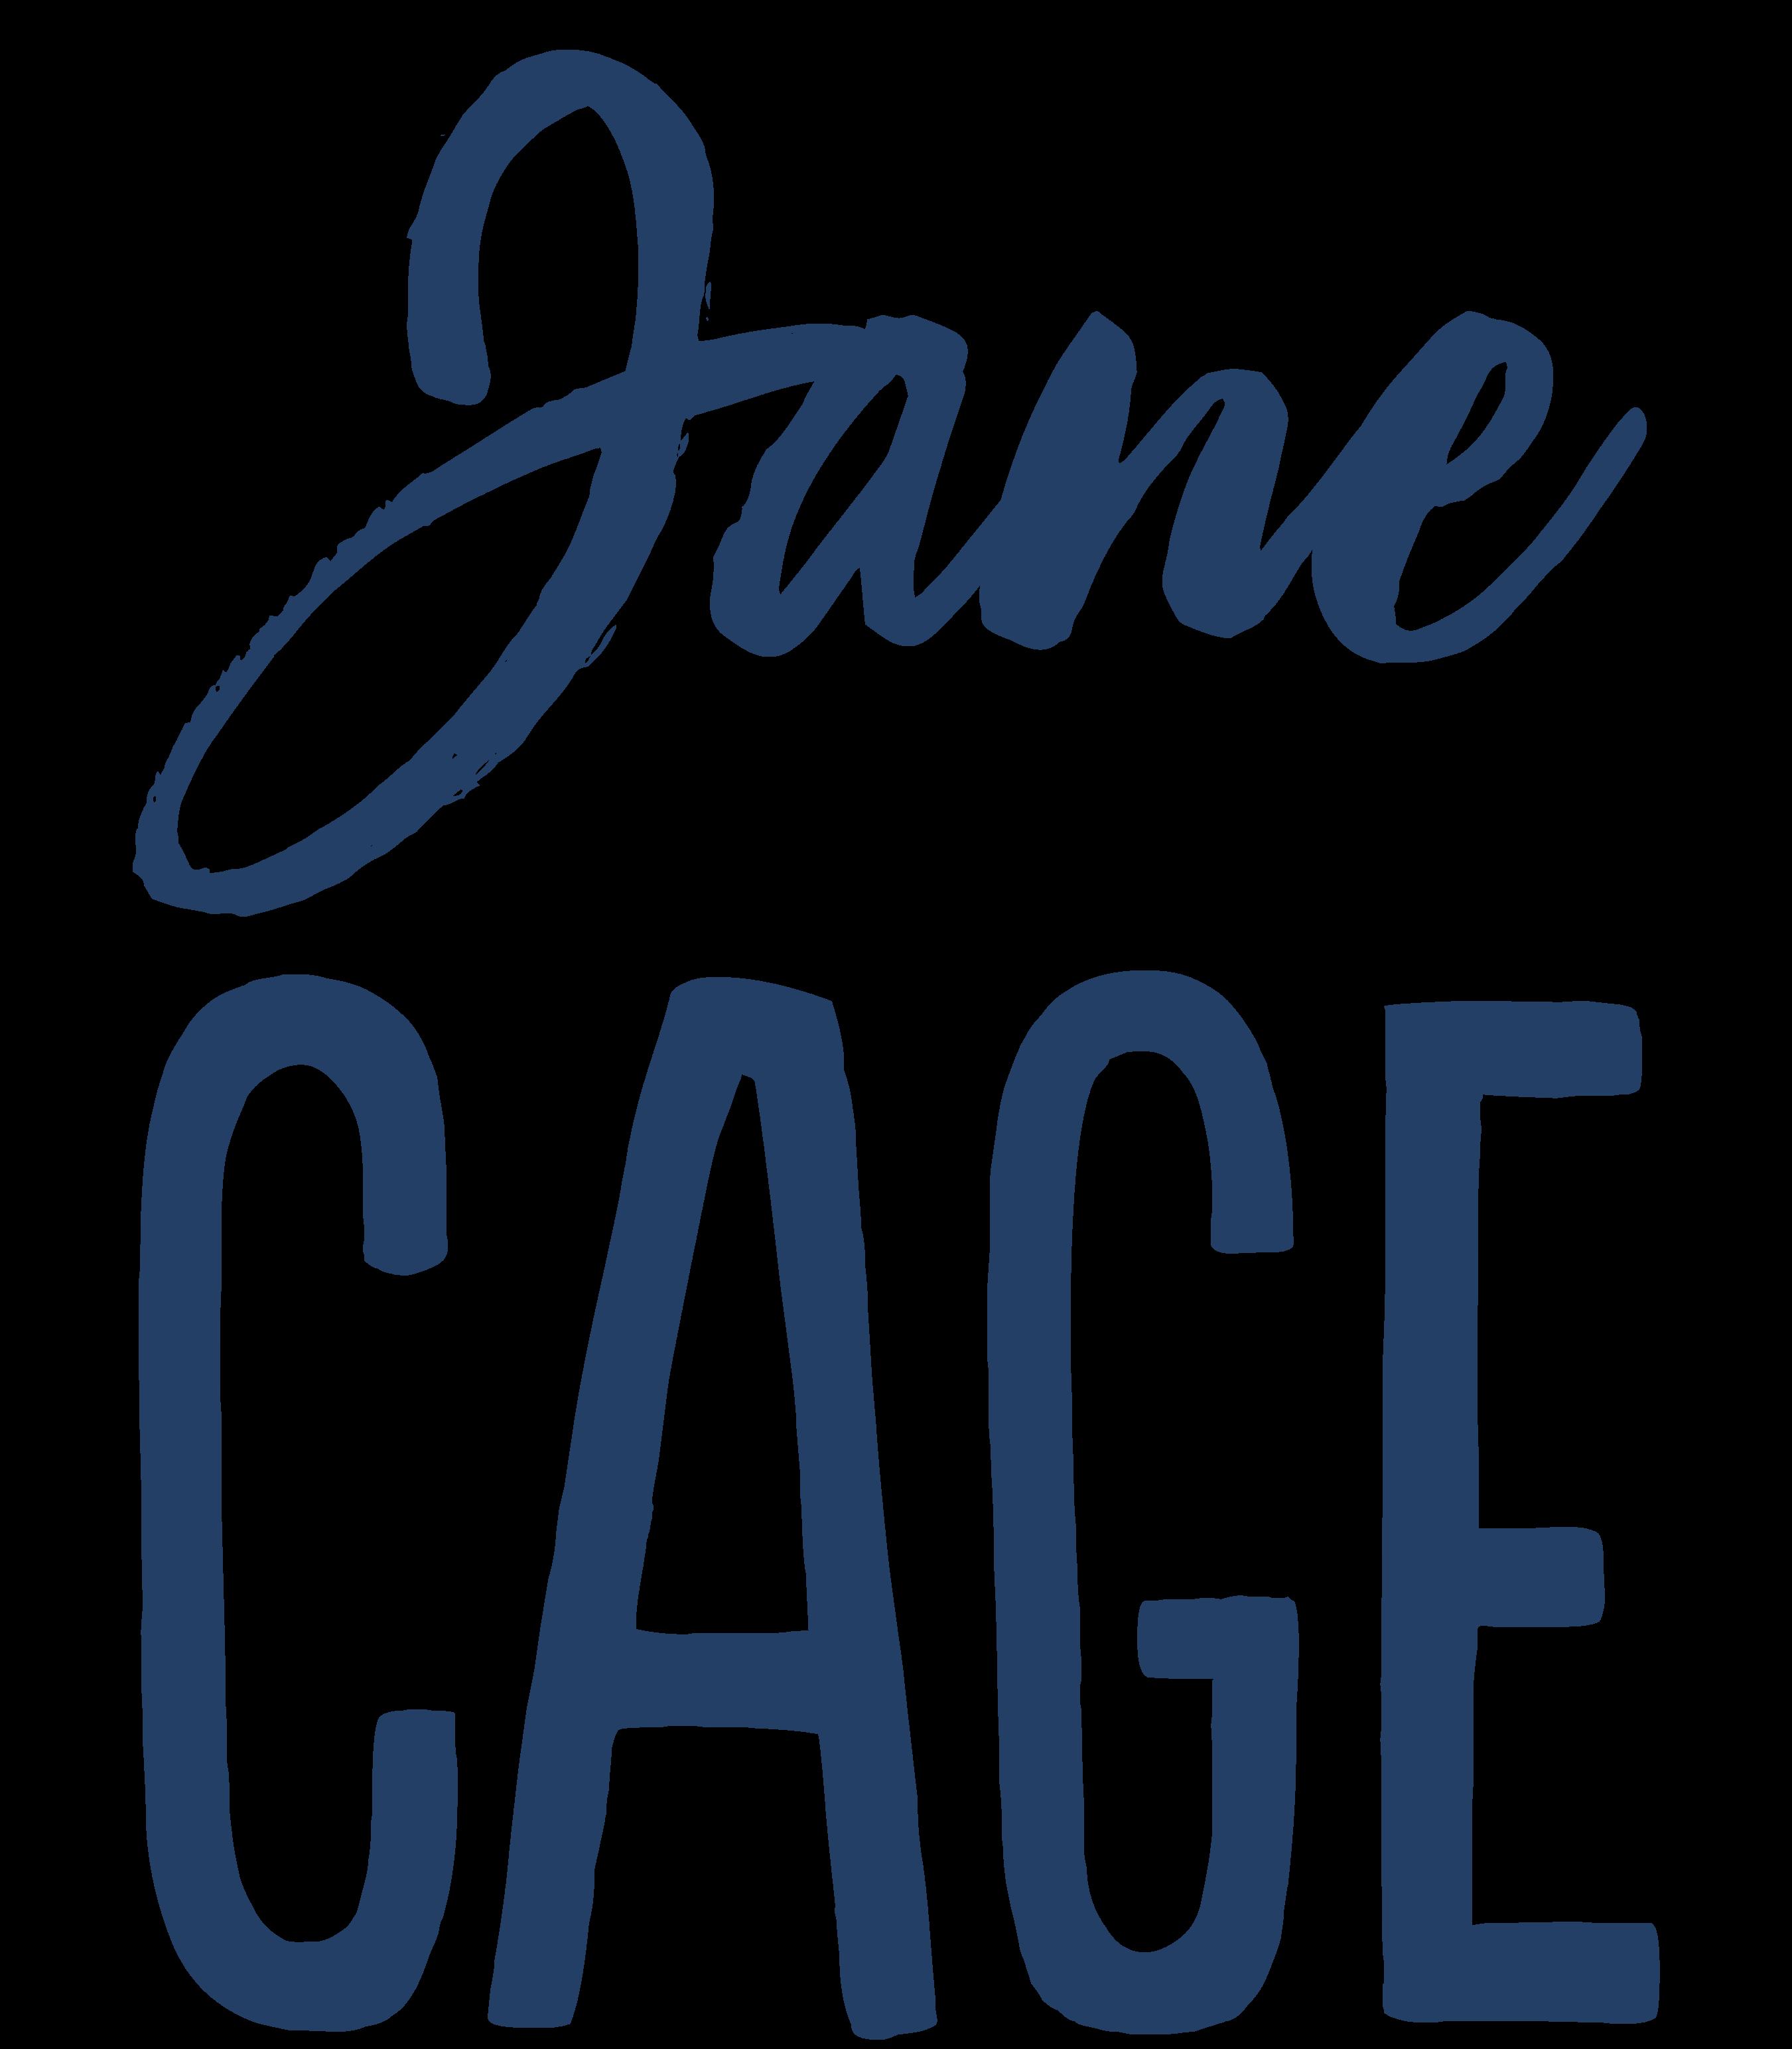 Jane Cage